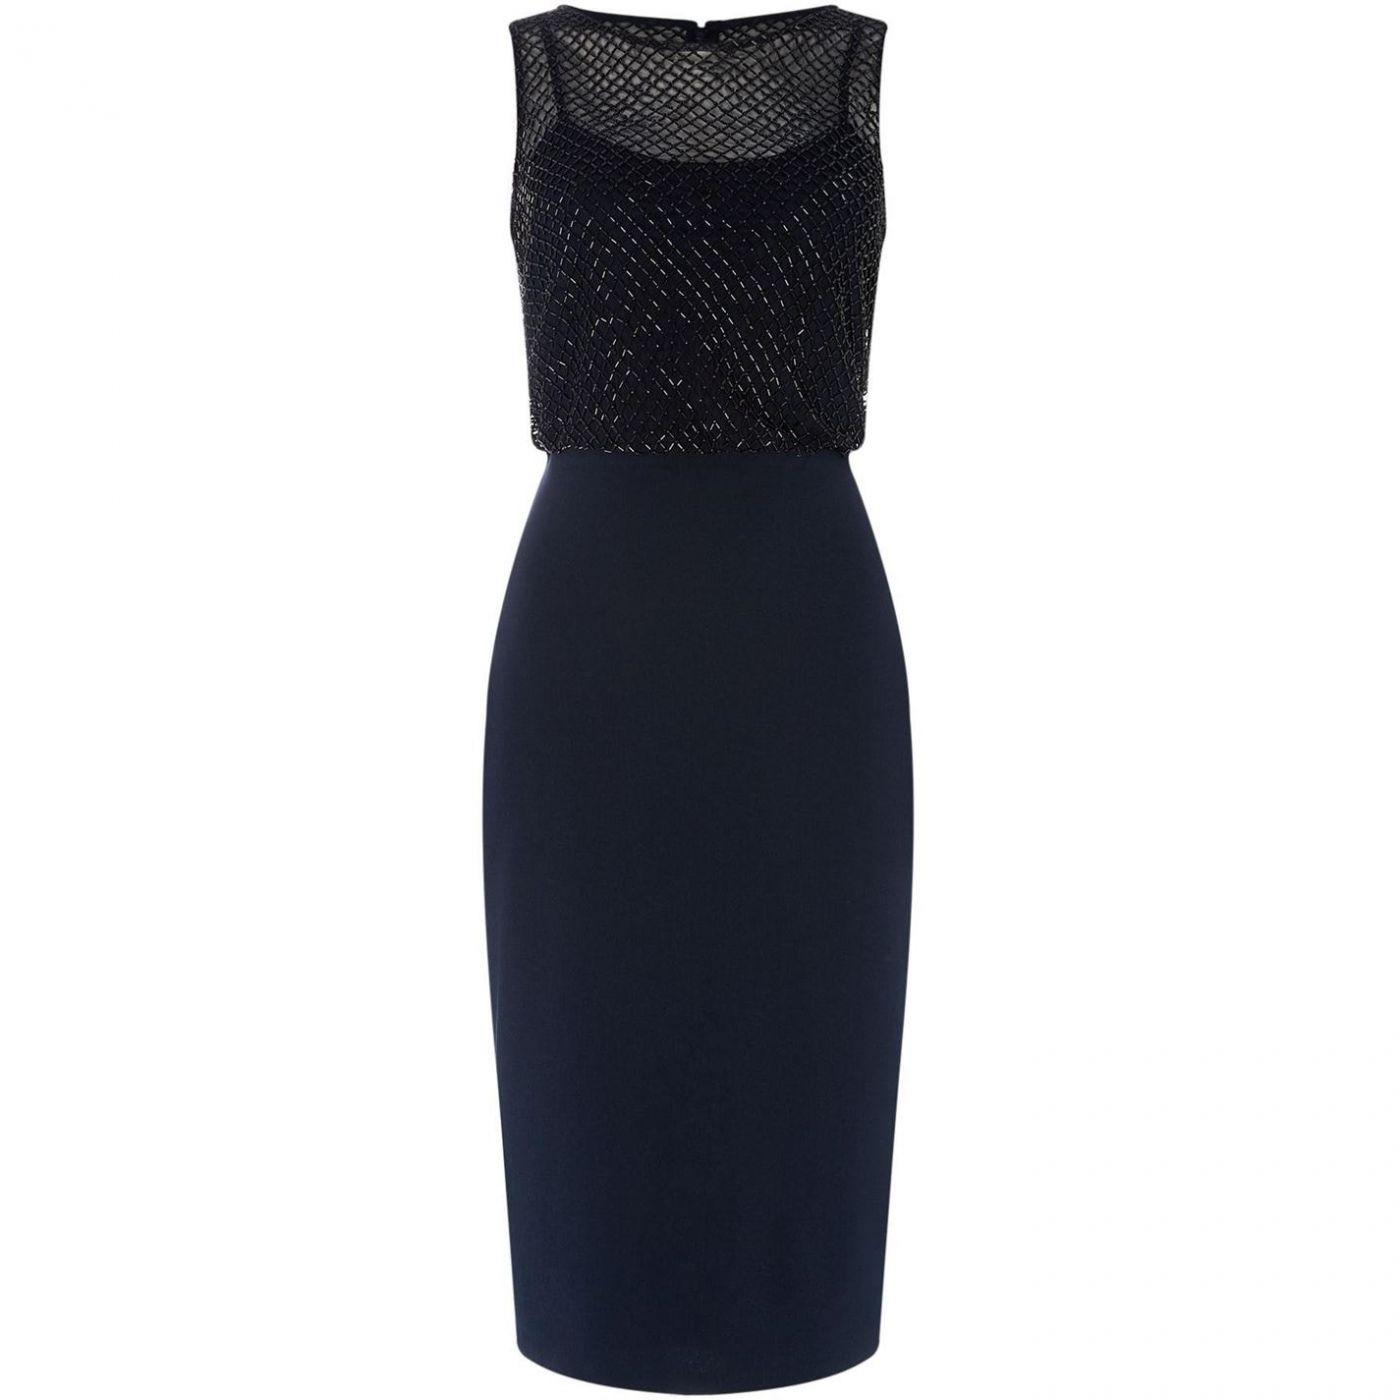 Adrianna Papell Embellished blouson shift dress